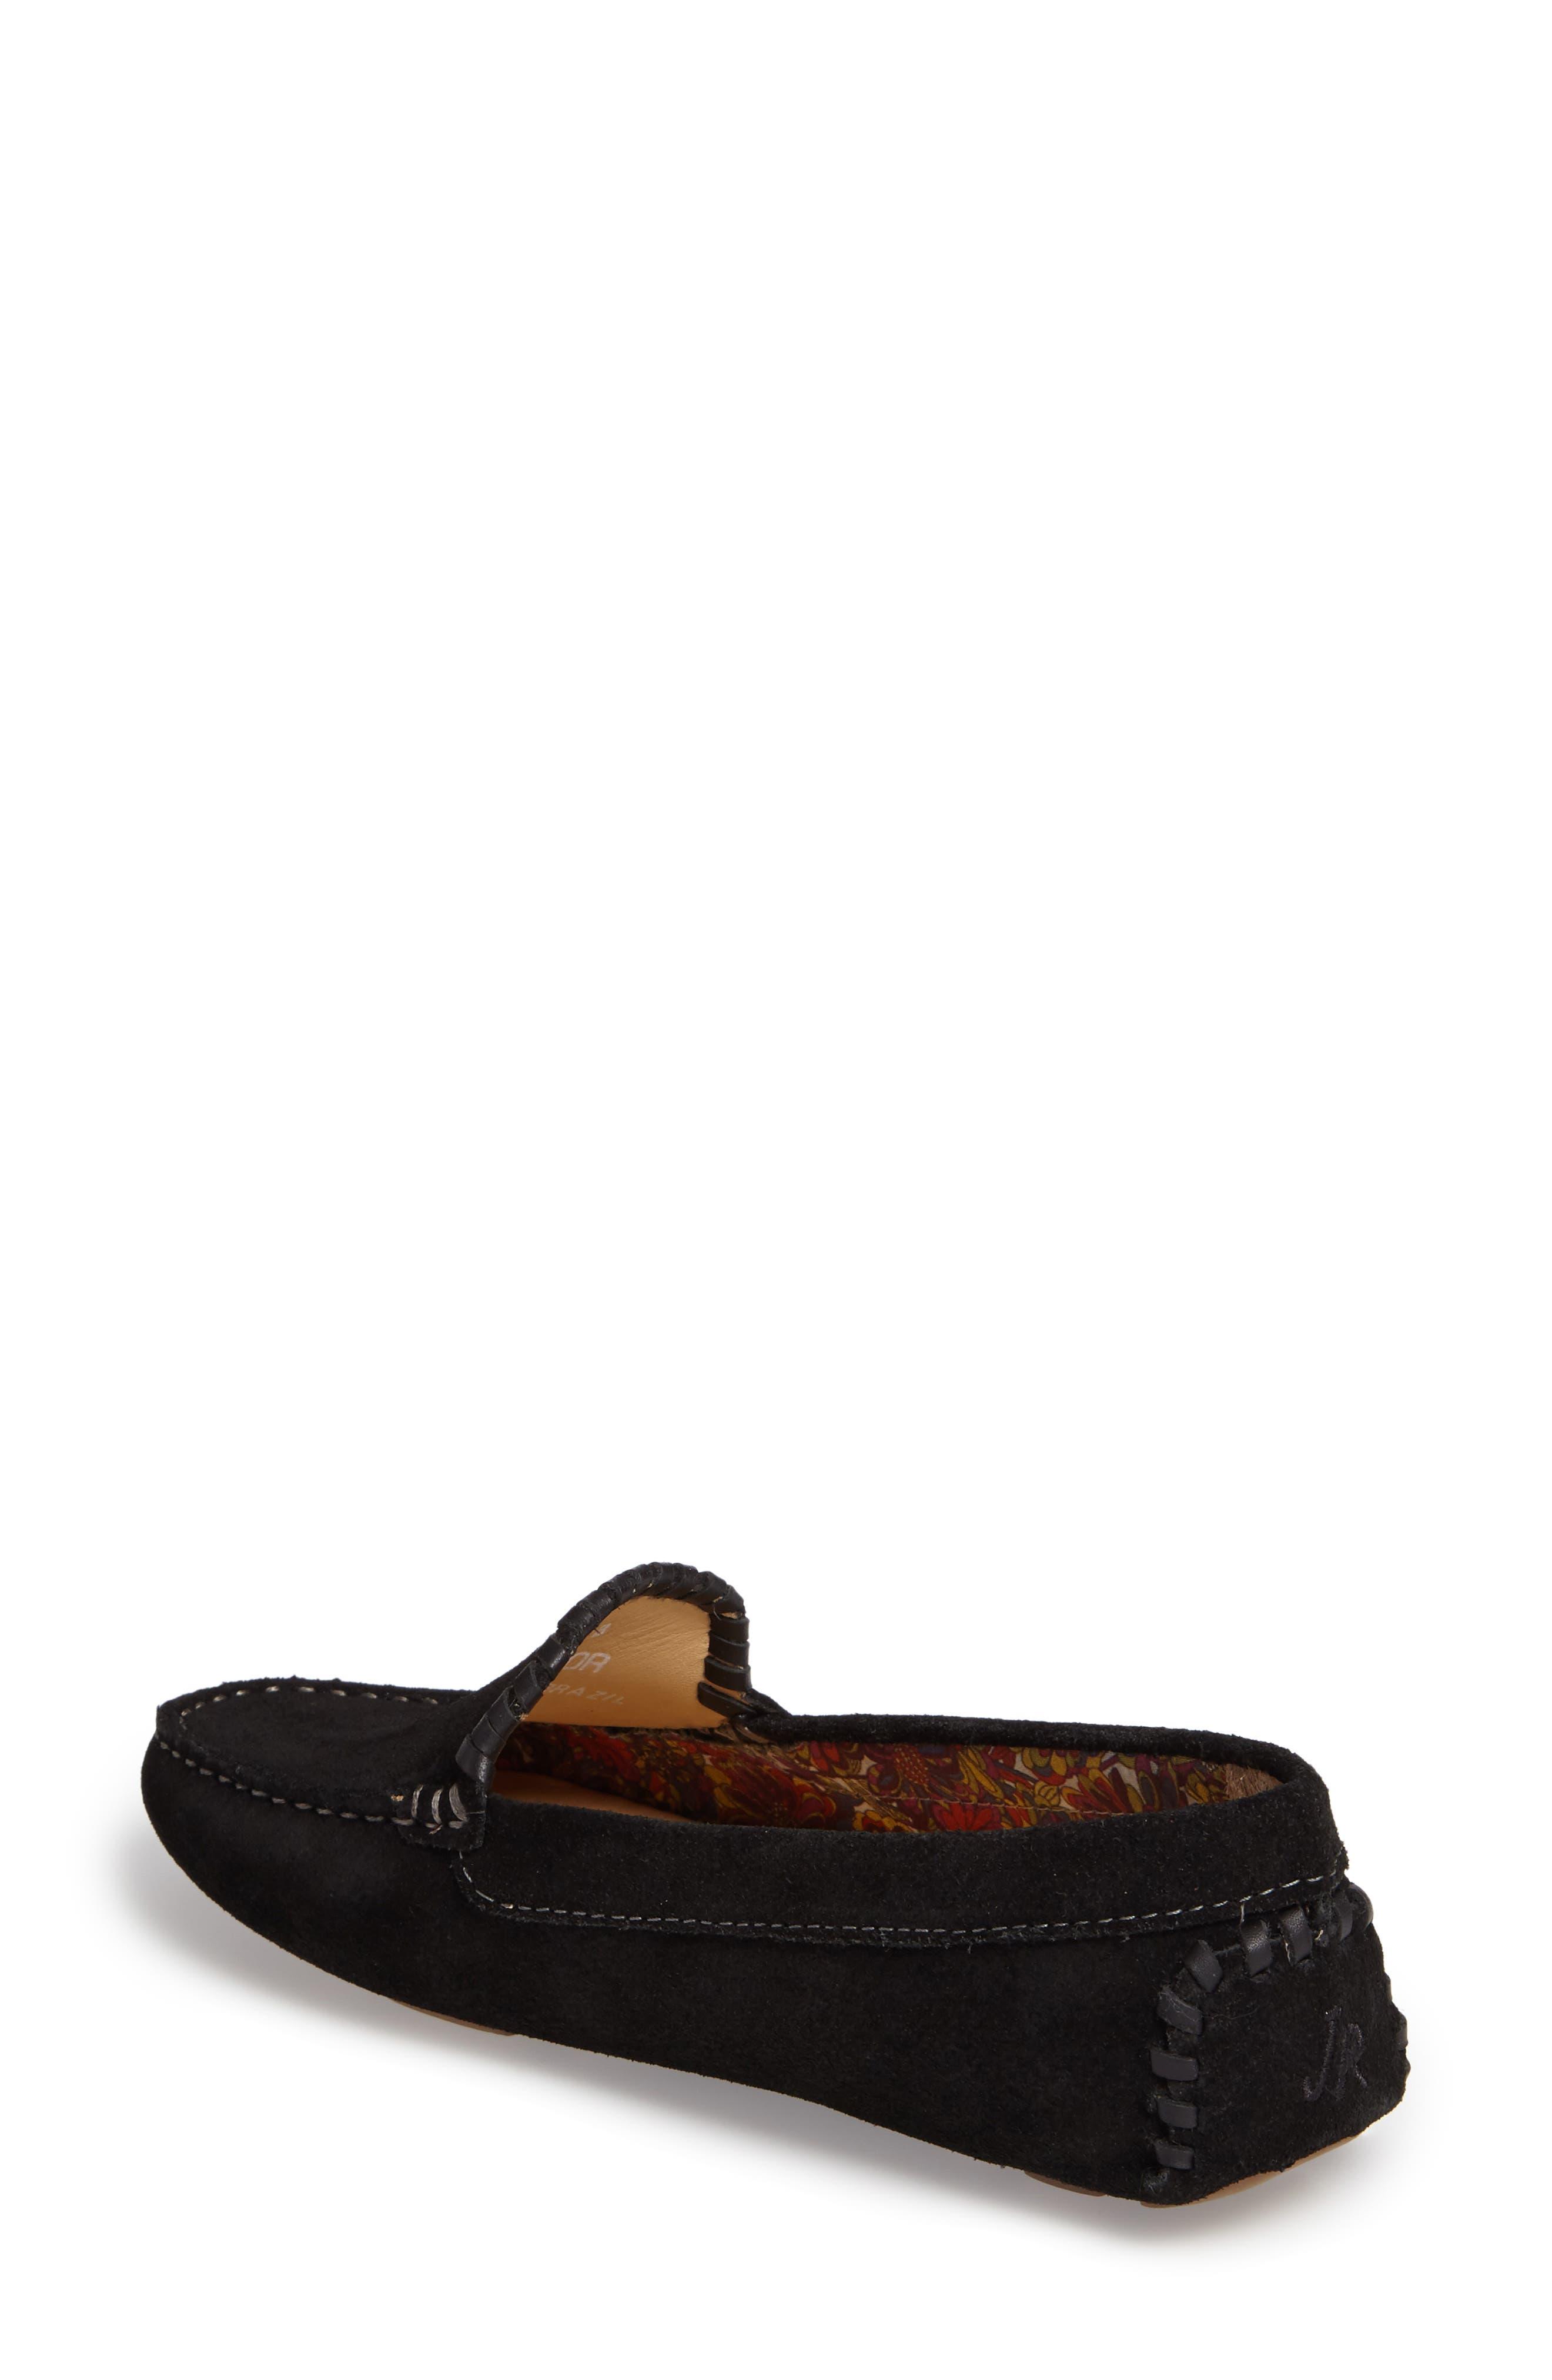 Taylor Driving Loafer,                             Alternate thumbnail 2, color,                             BLACK SUEDE